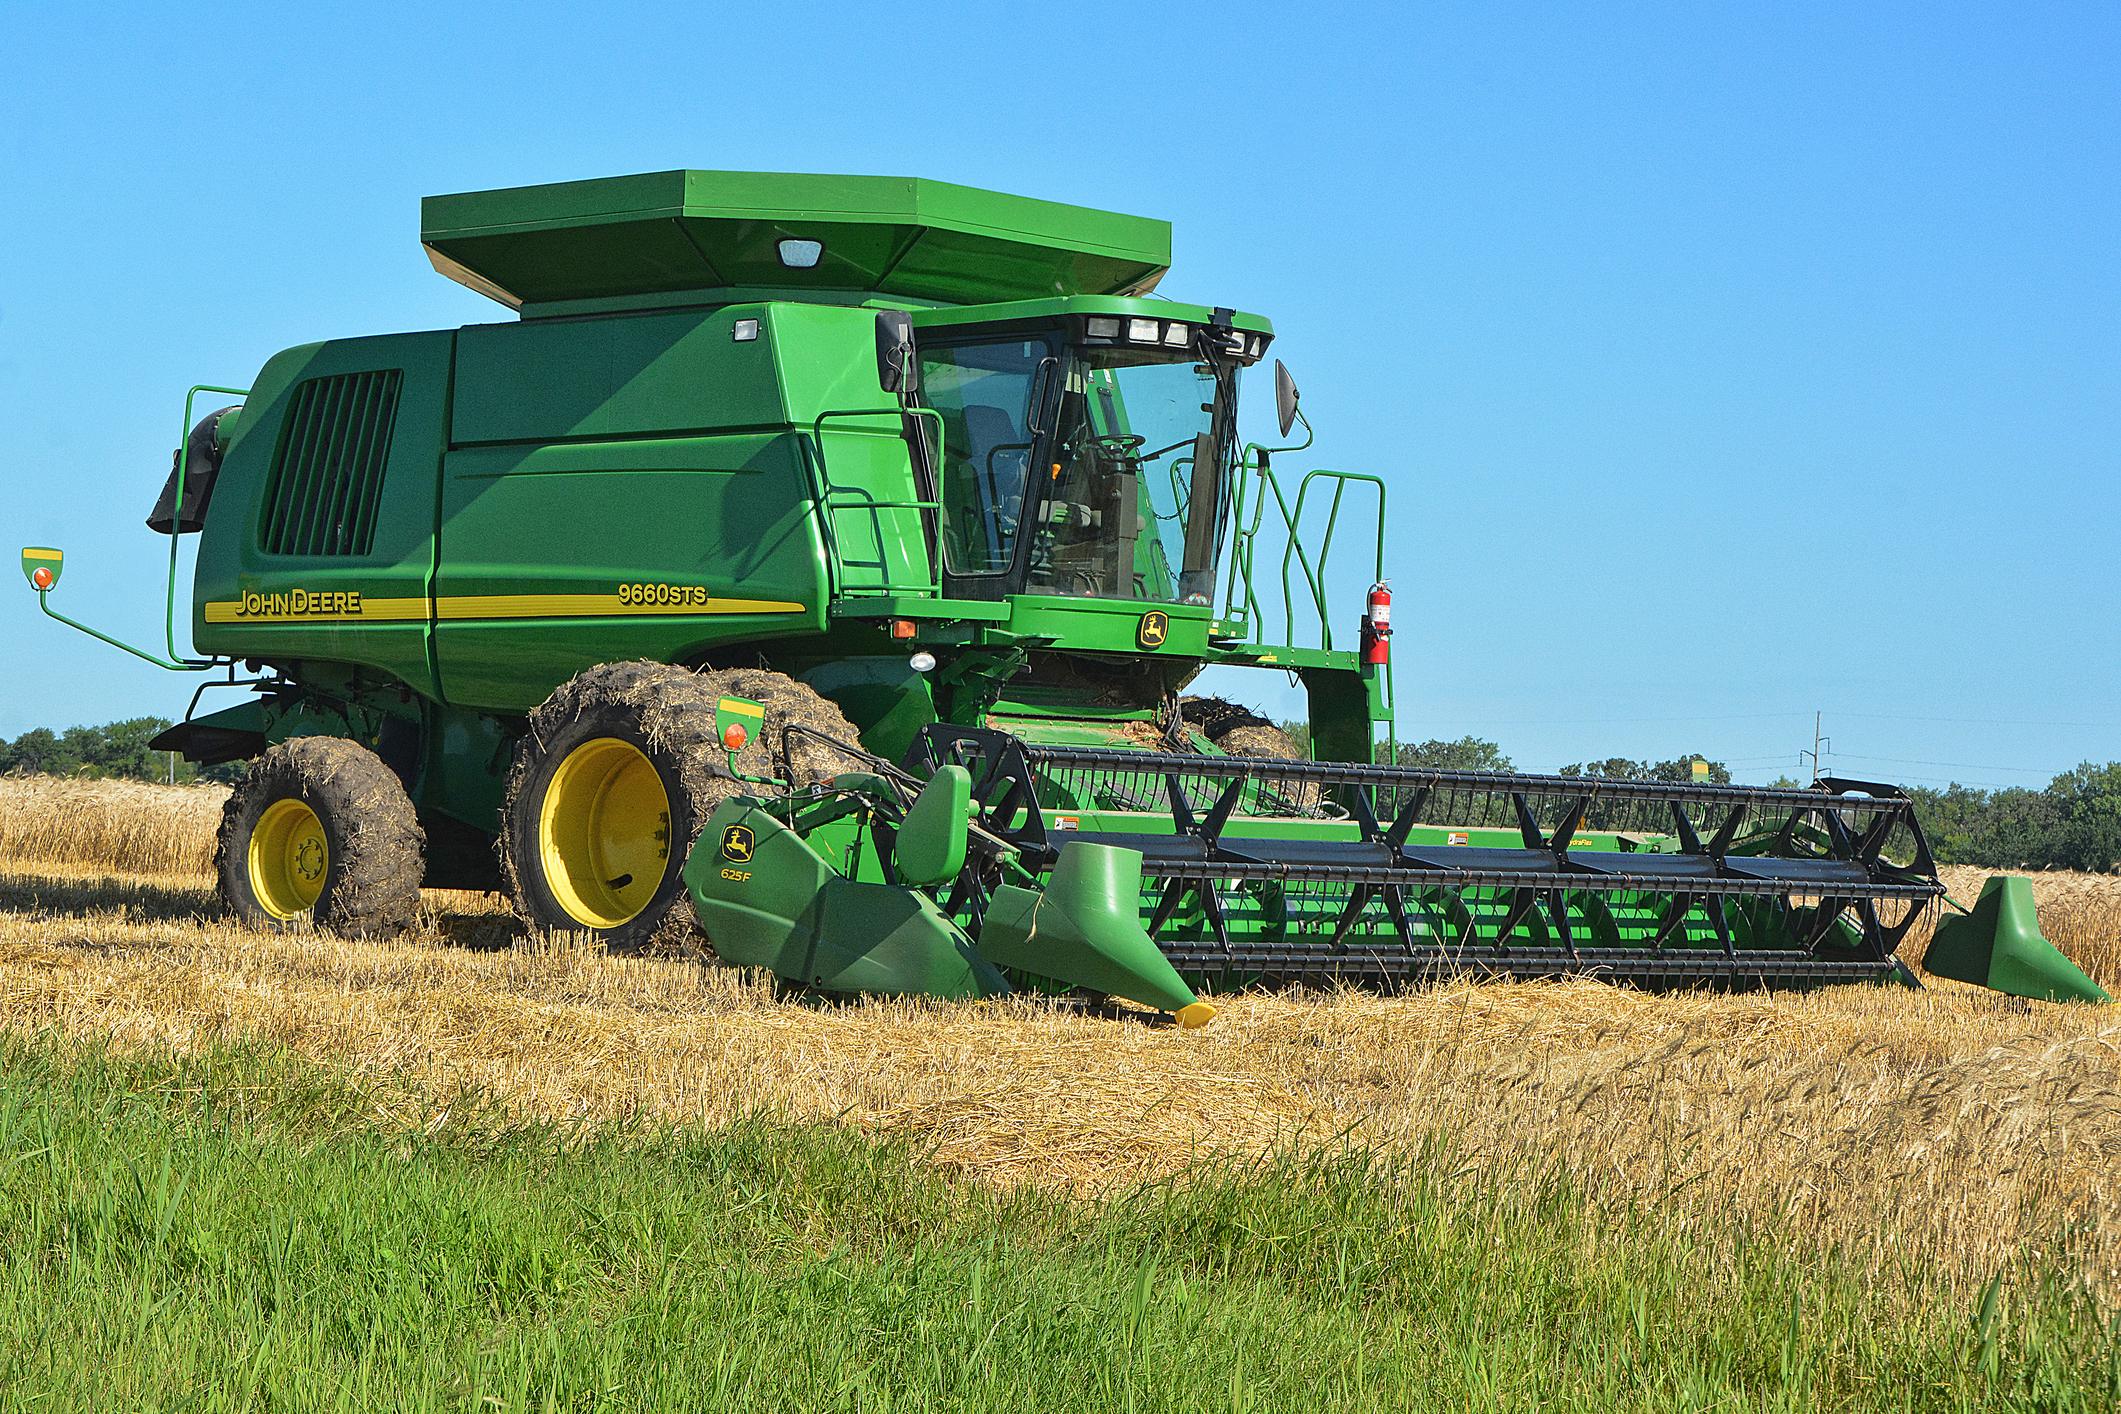 a Deere combine harvester in a field.